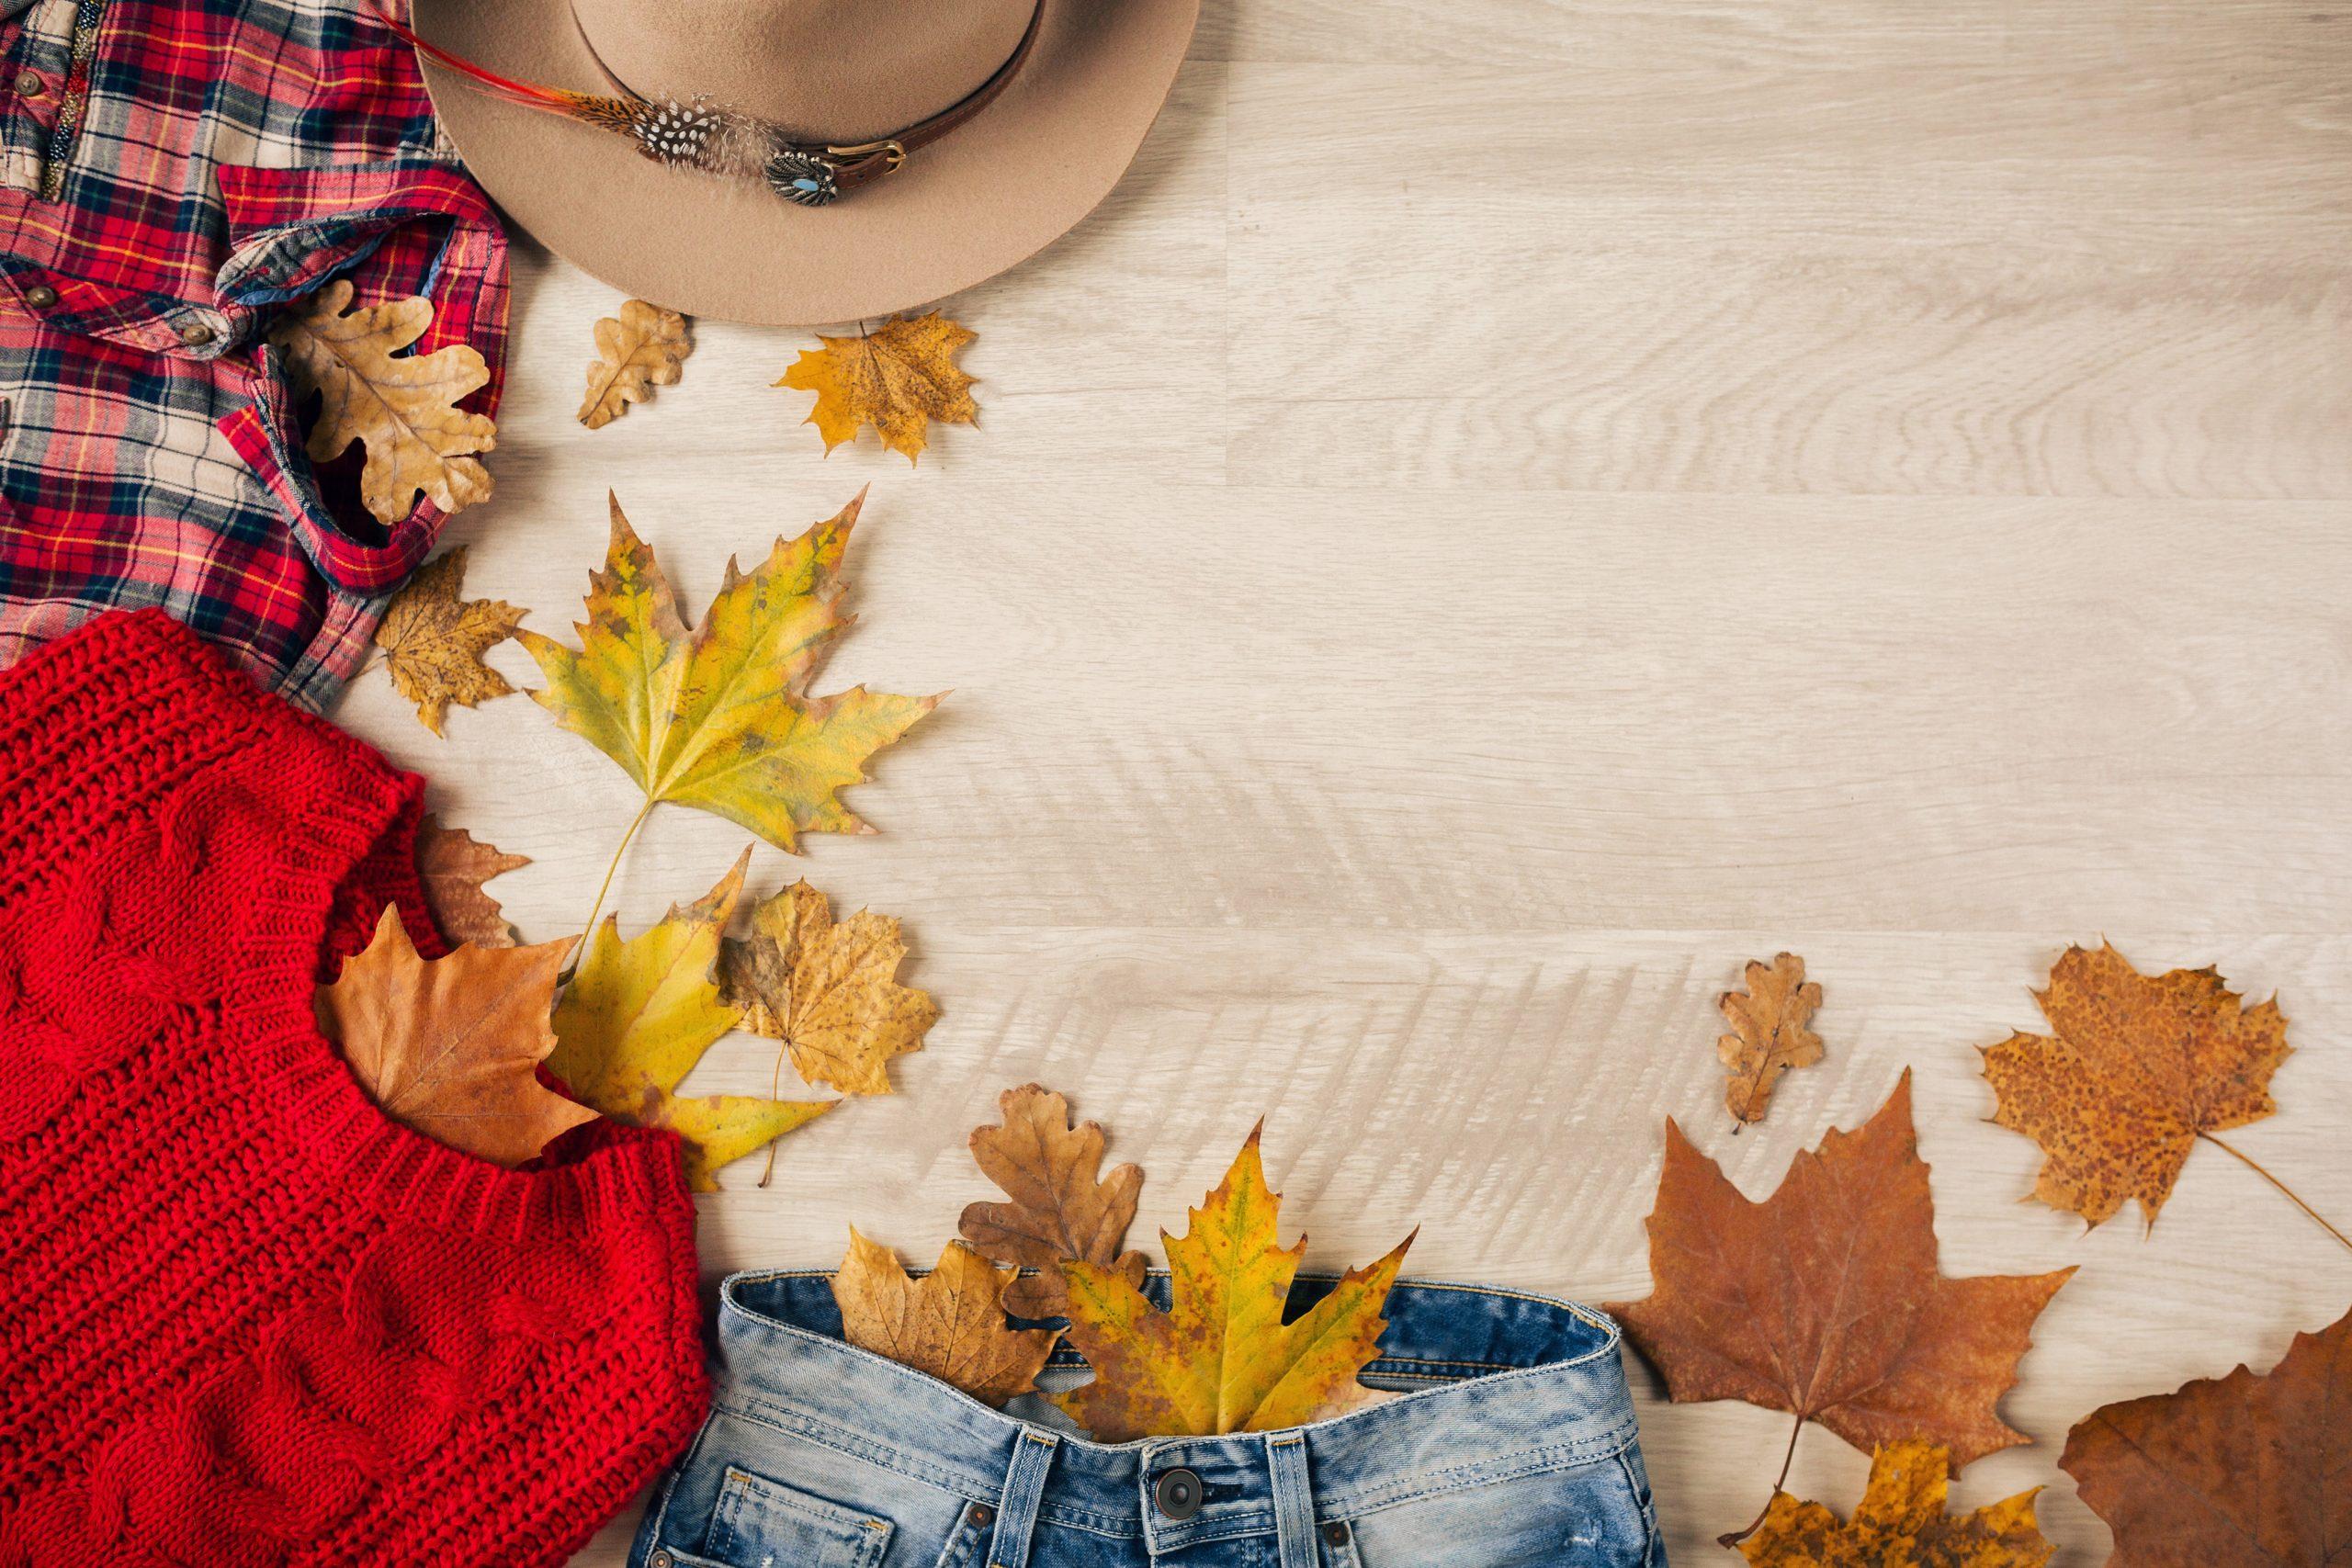 calzados-arpe-tendencias-otoño-invierno-20-21